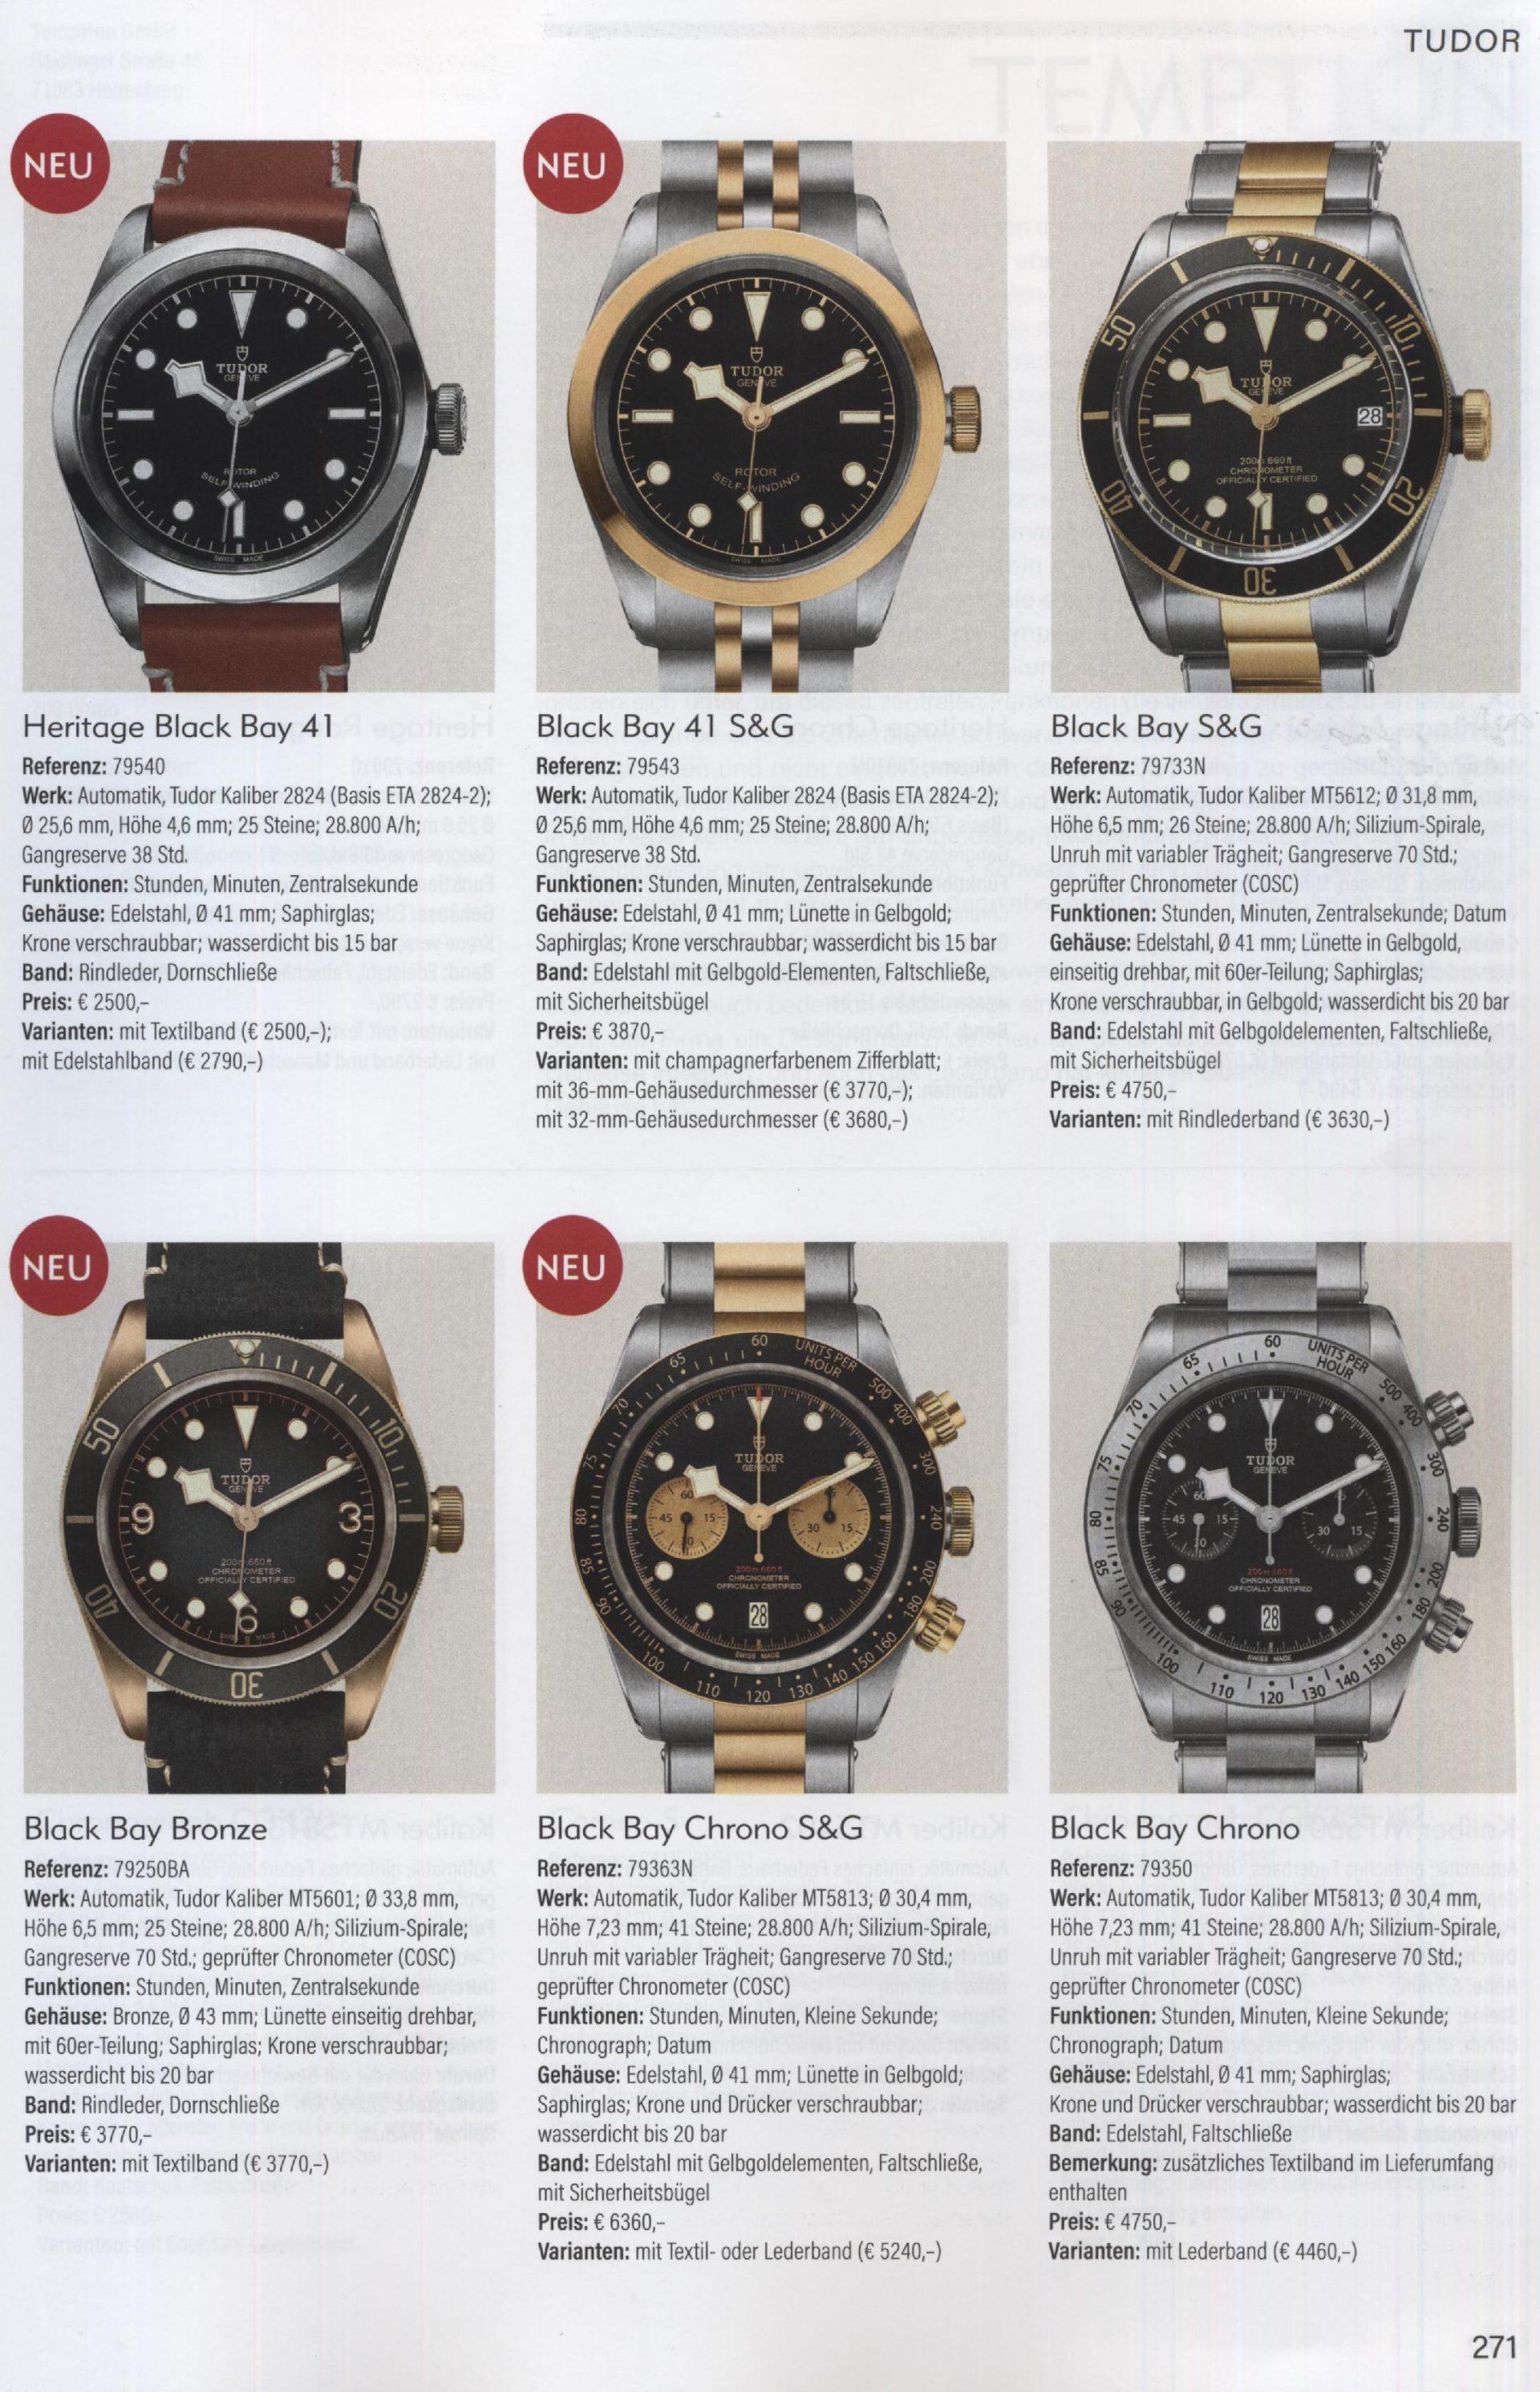 Armbanduhren Katalog Heel 2019 Tudor